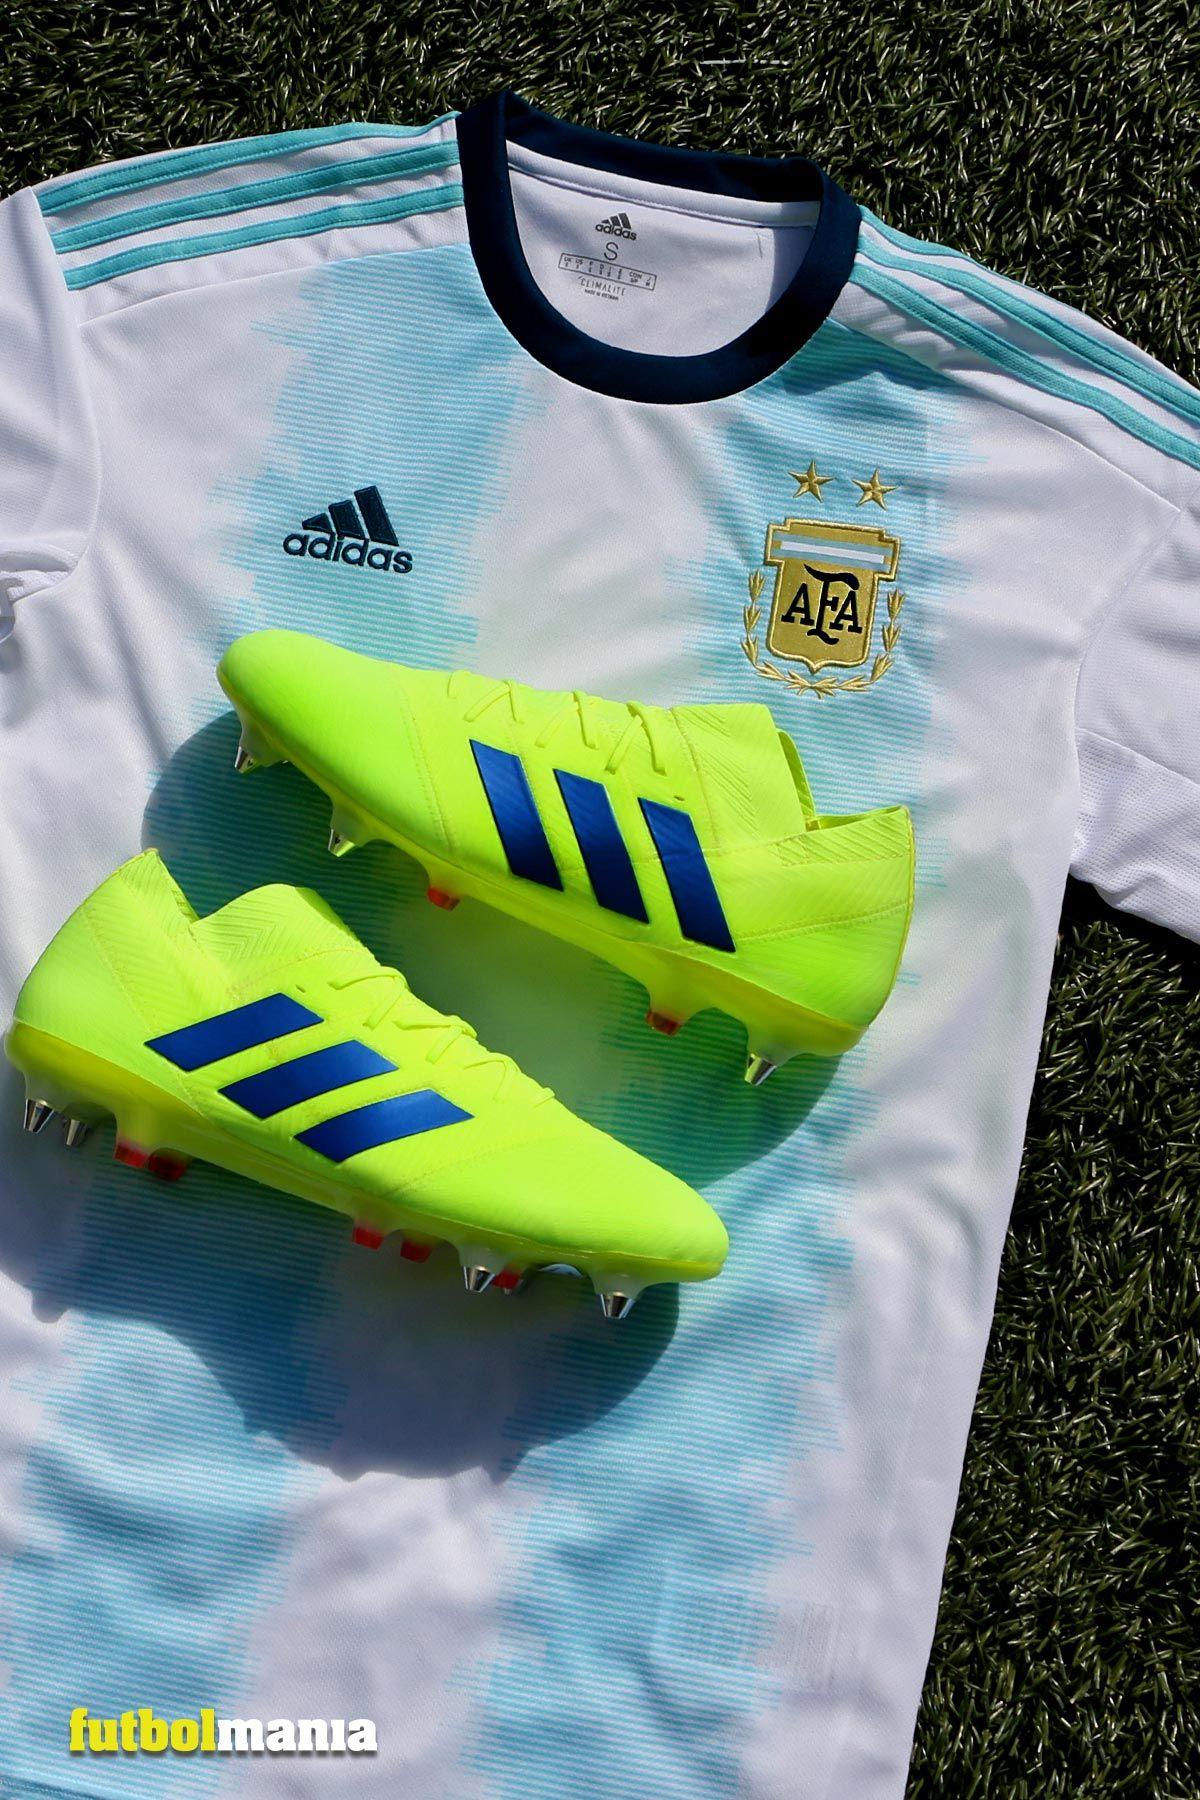 Camisetas de Adidas para Rusia 2018, diseñadas con un toque